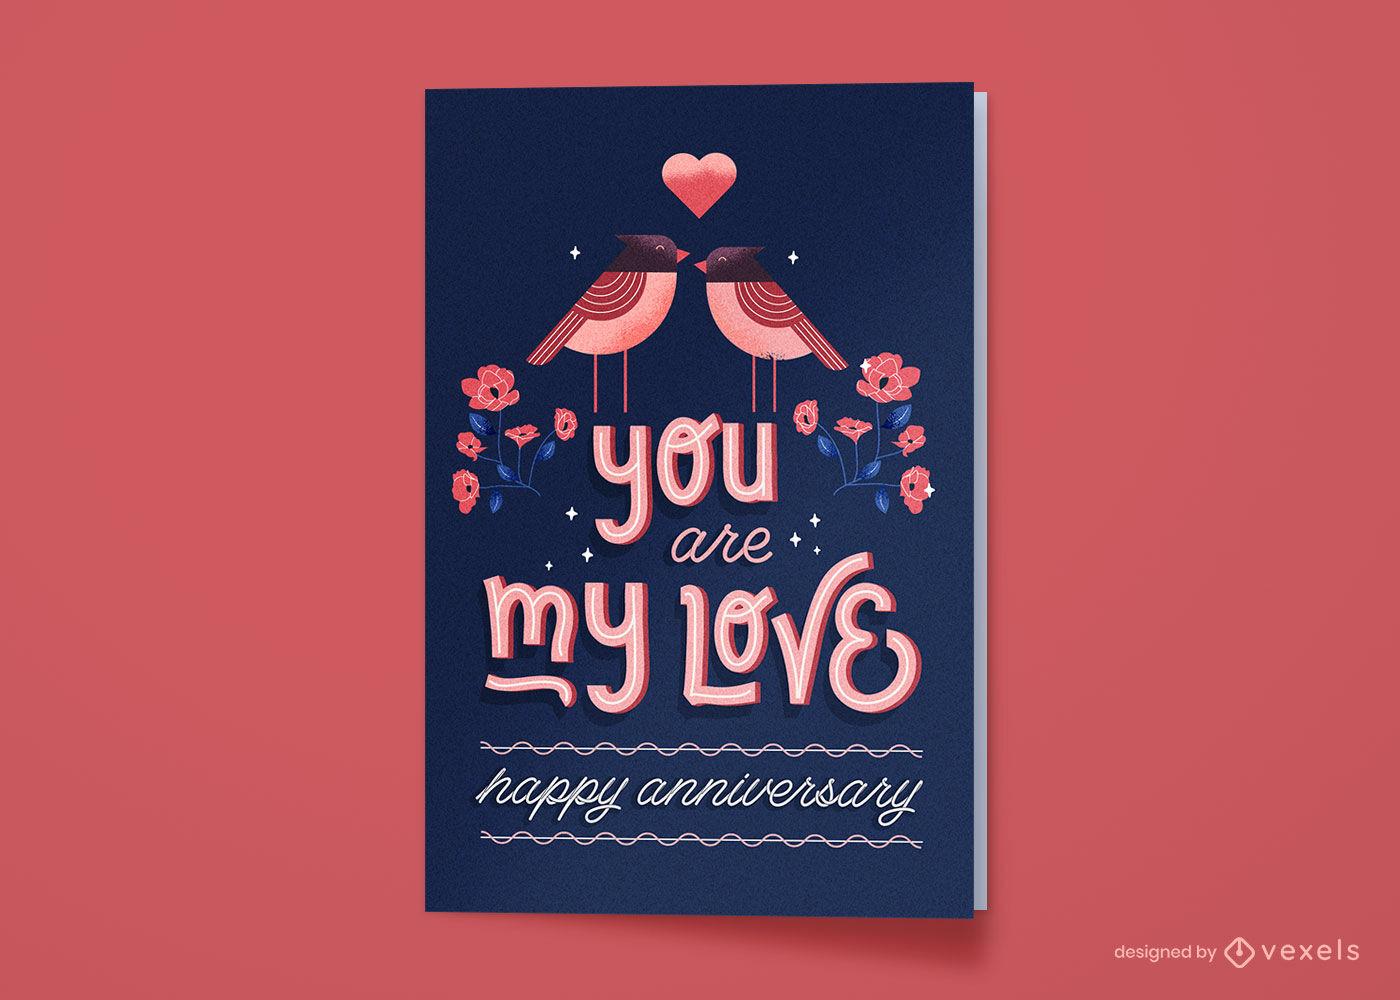 Happy anniversary love greeting card